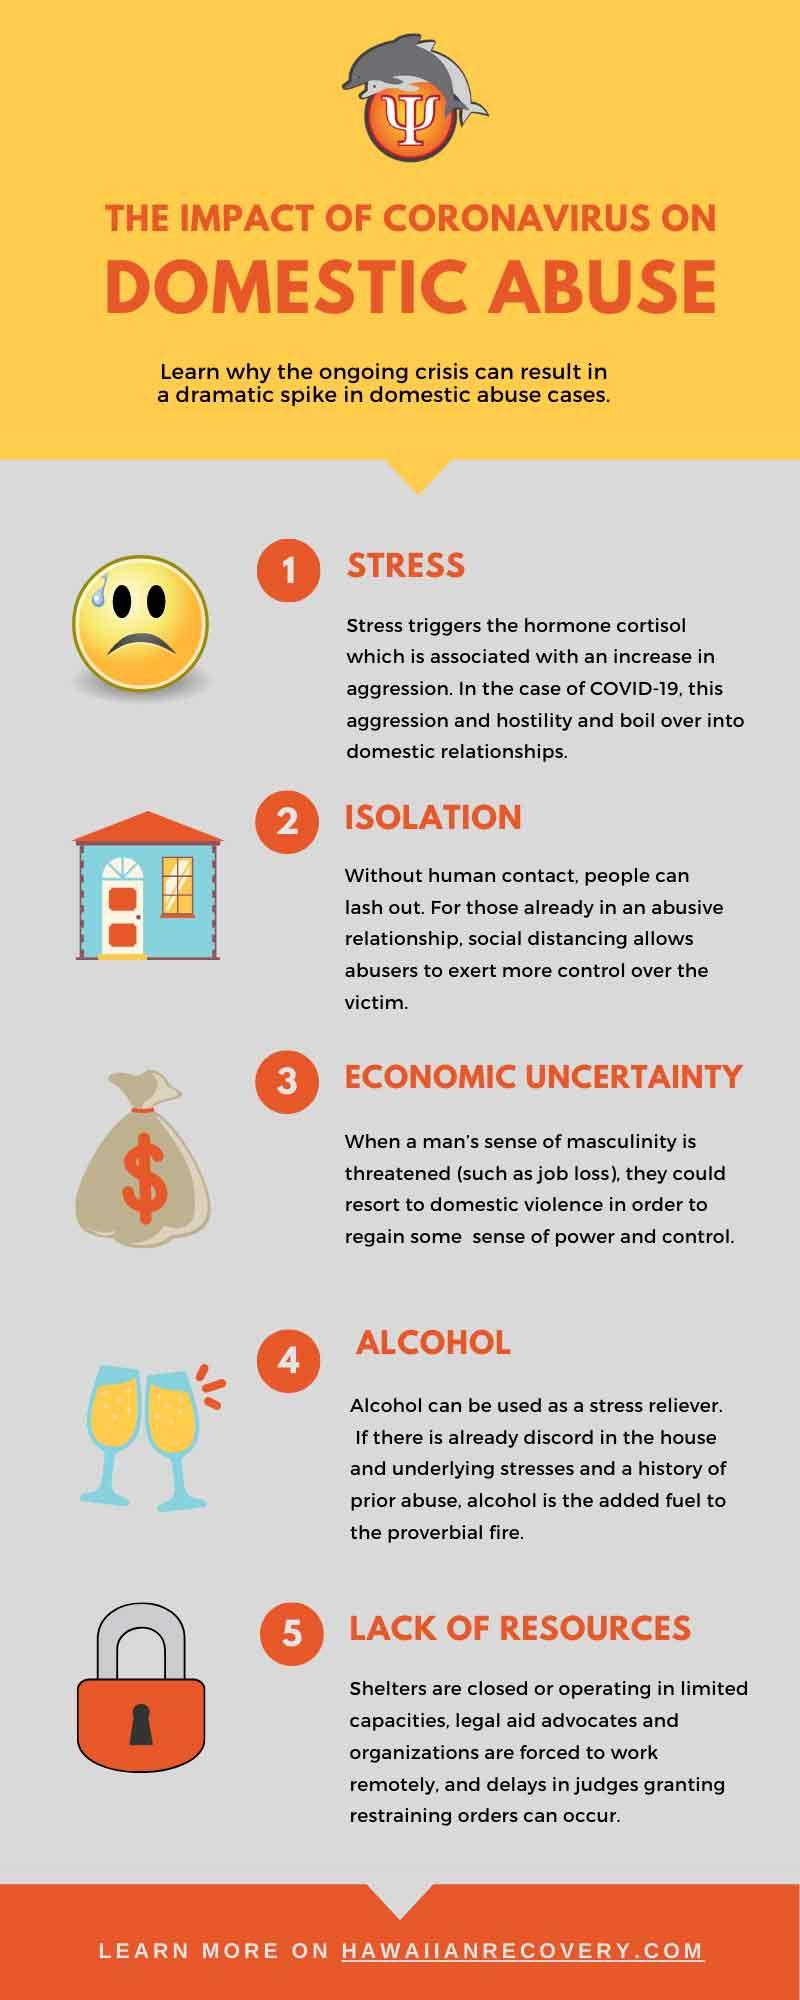 The impact of coronavirus on domestic abuse